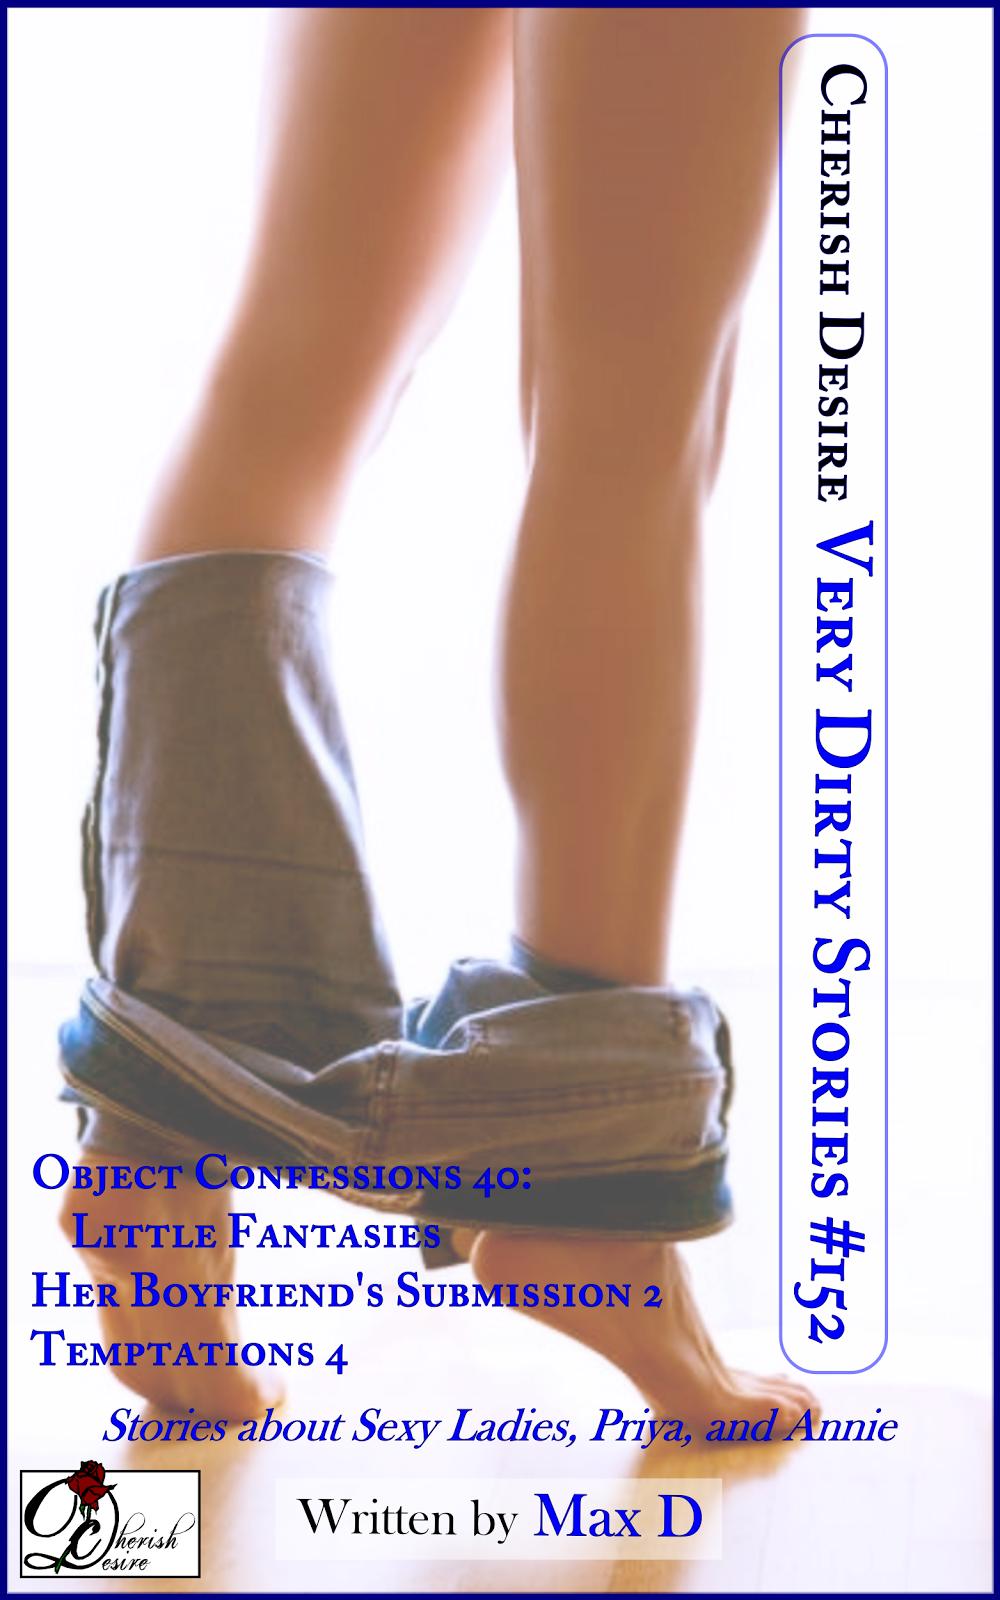 Cherish Desire: Very Dirty Stories #152, Max D, erotica